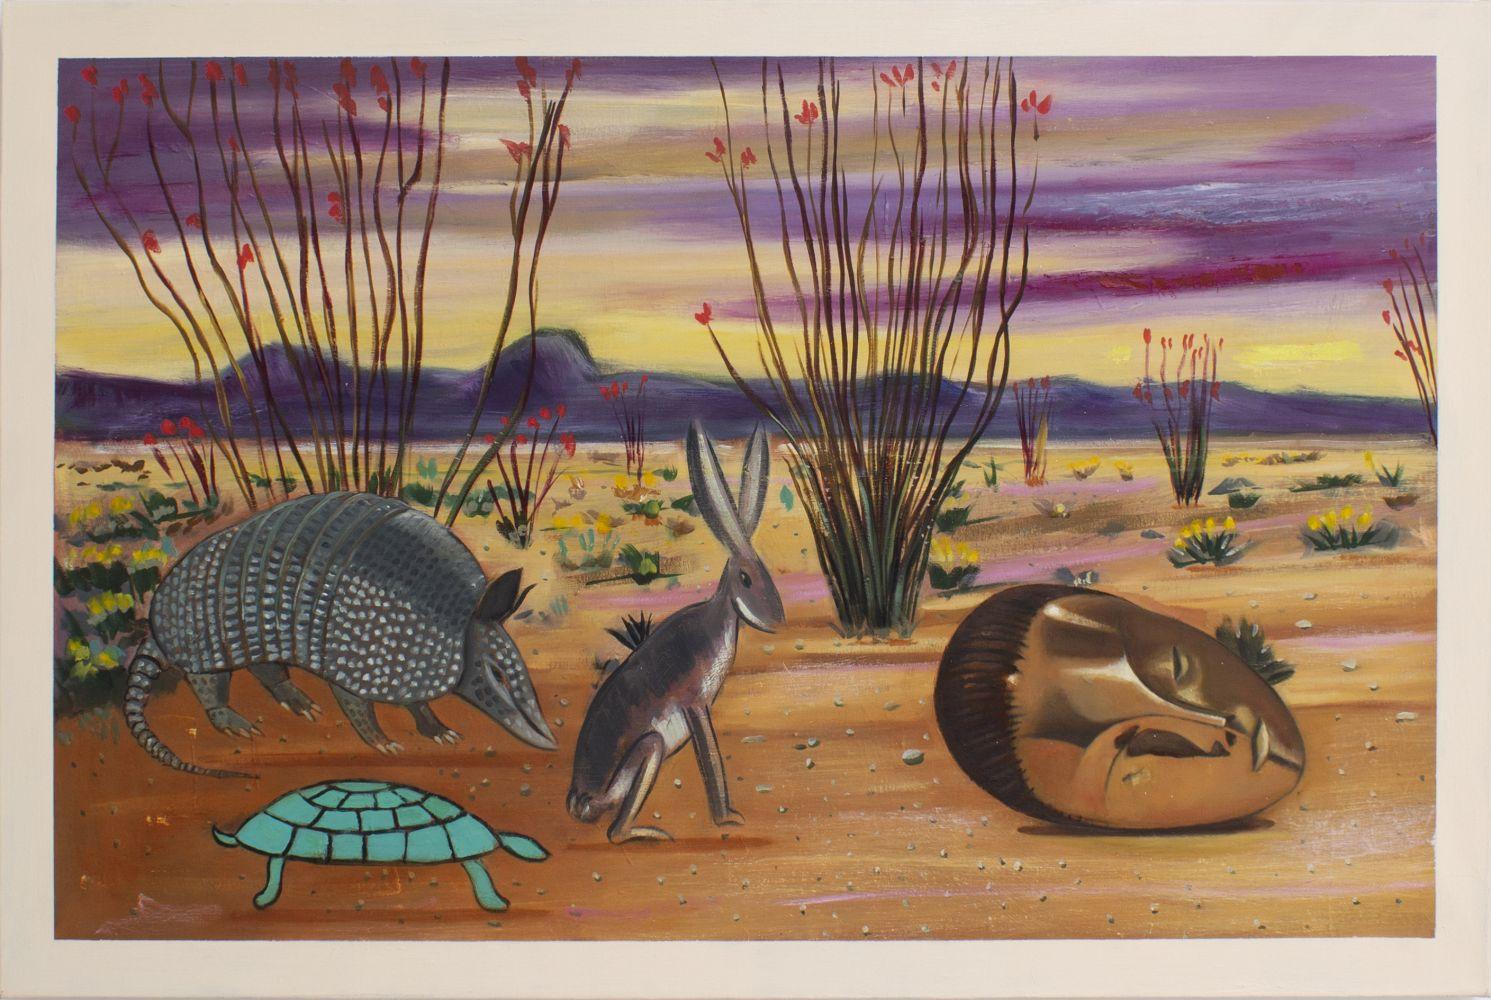 Raul Guerrero  Ocotillo in Bloom on the Desert, 2020